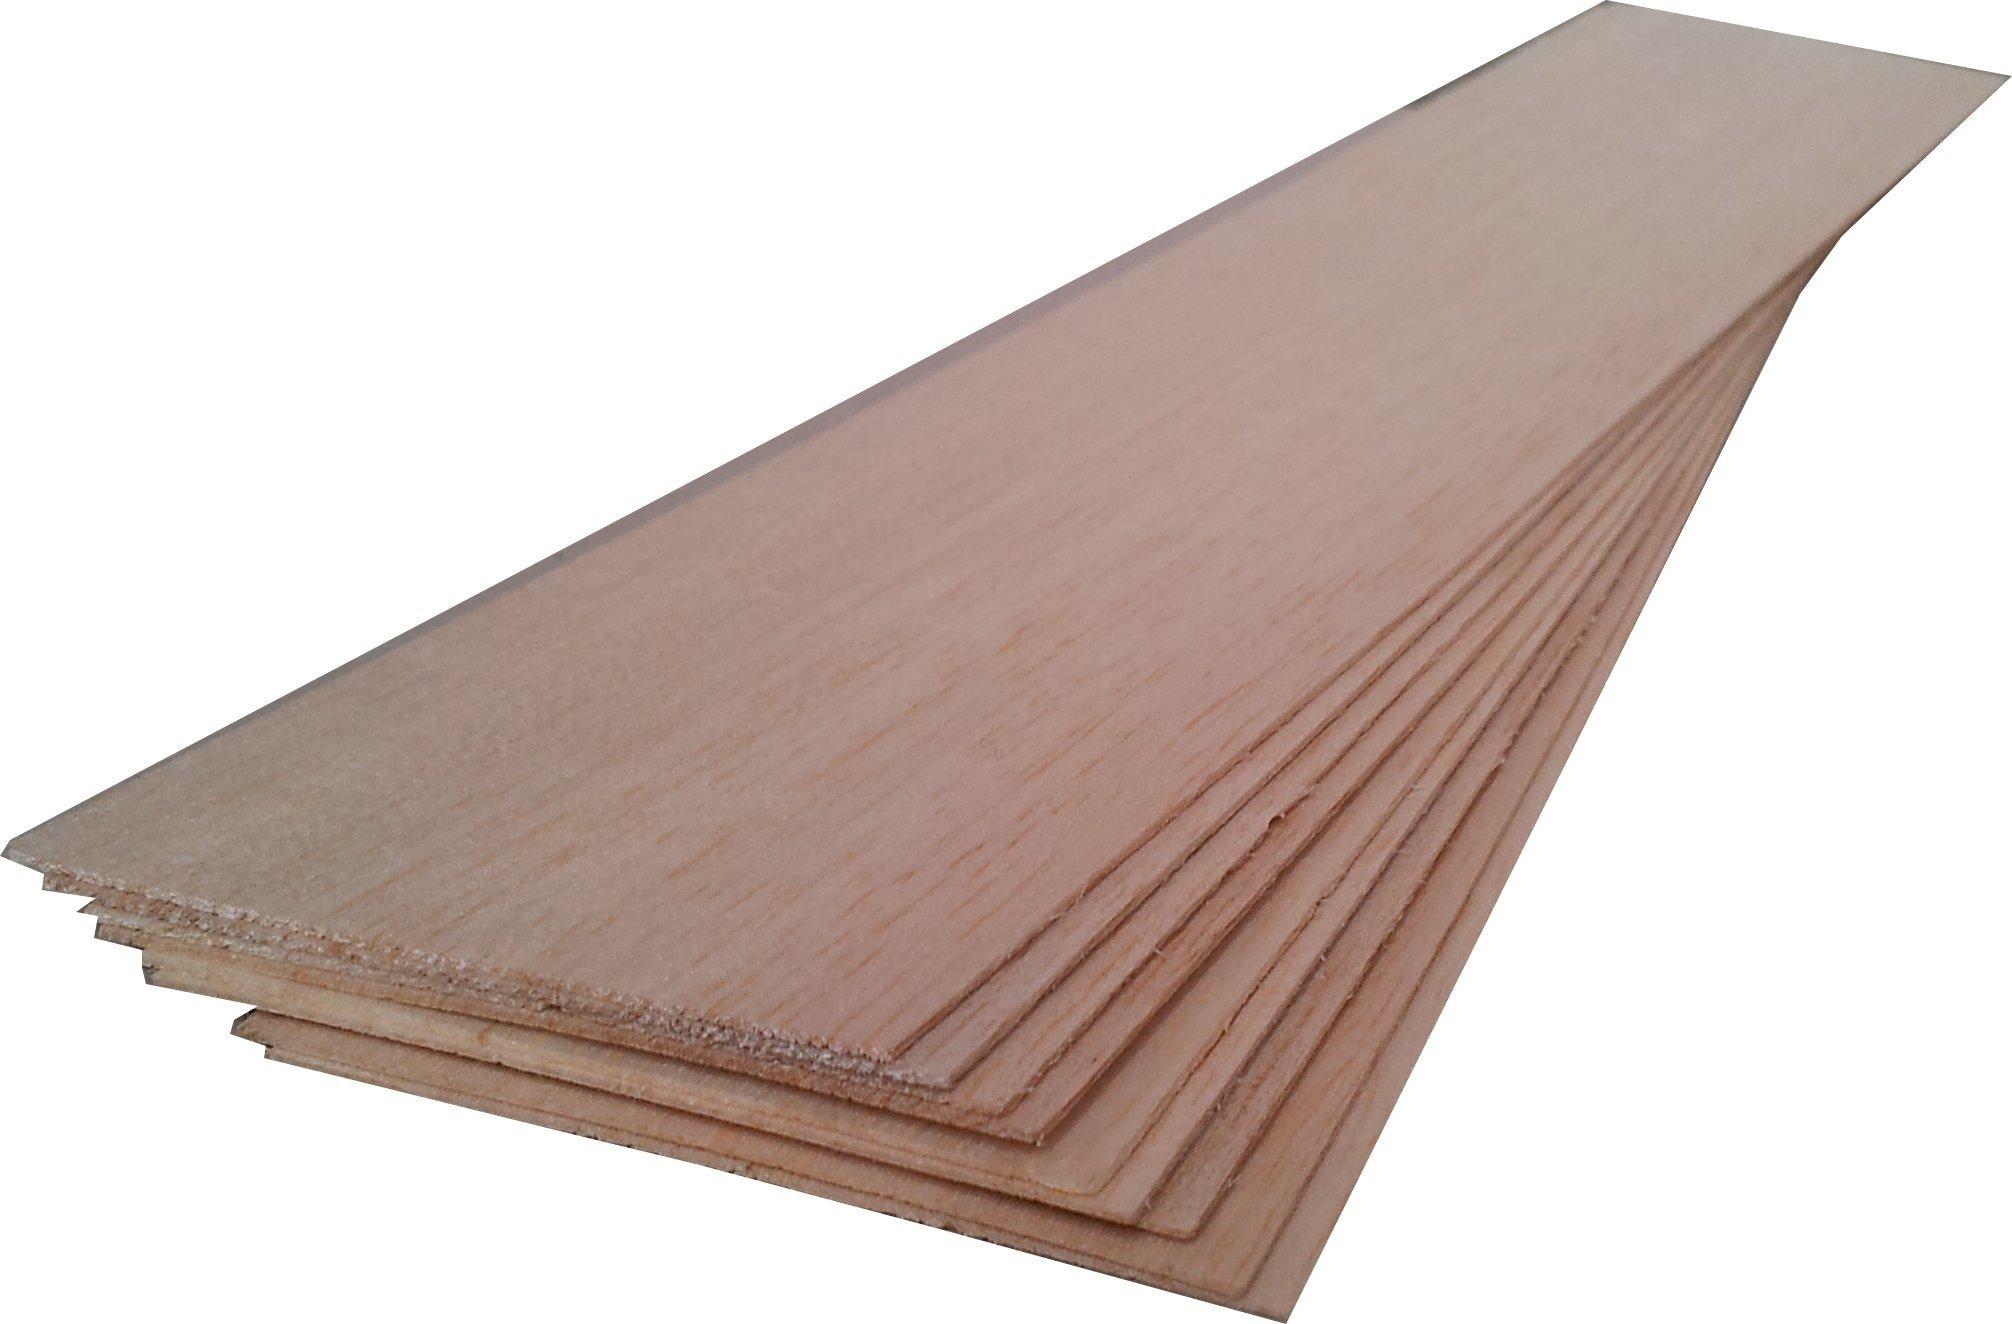 BALSA WOOD 10 sheets 12'' x 3'' x 1/16'' (306mm x 75mm x 1.5mm)